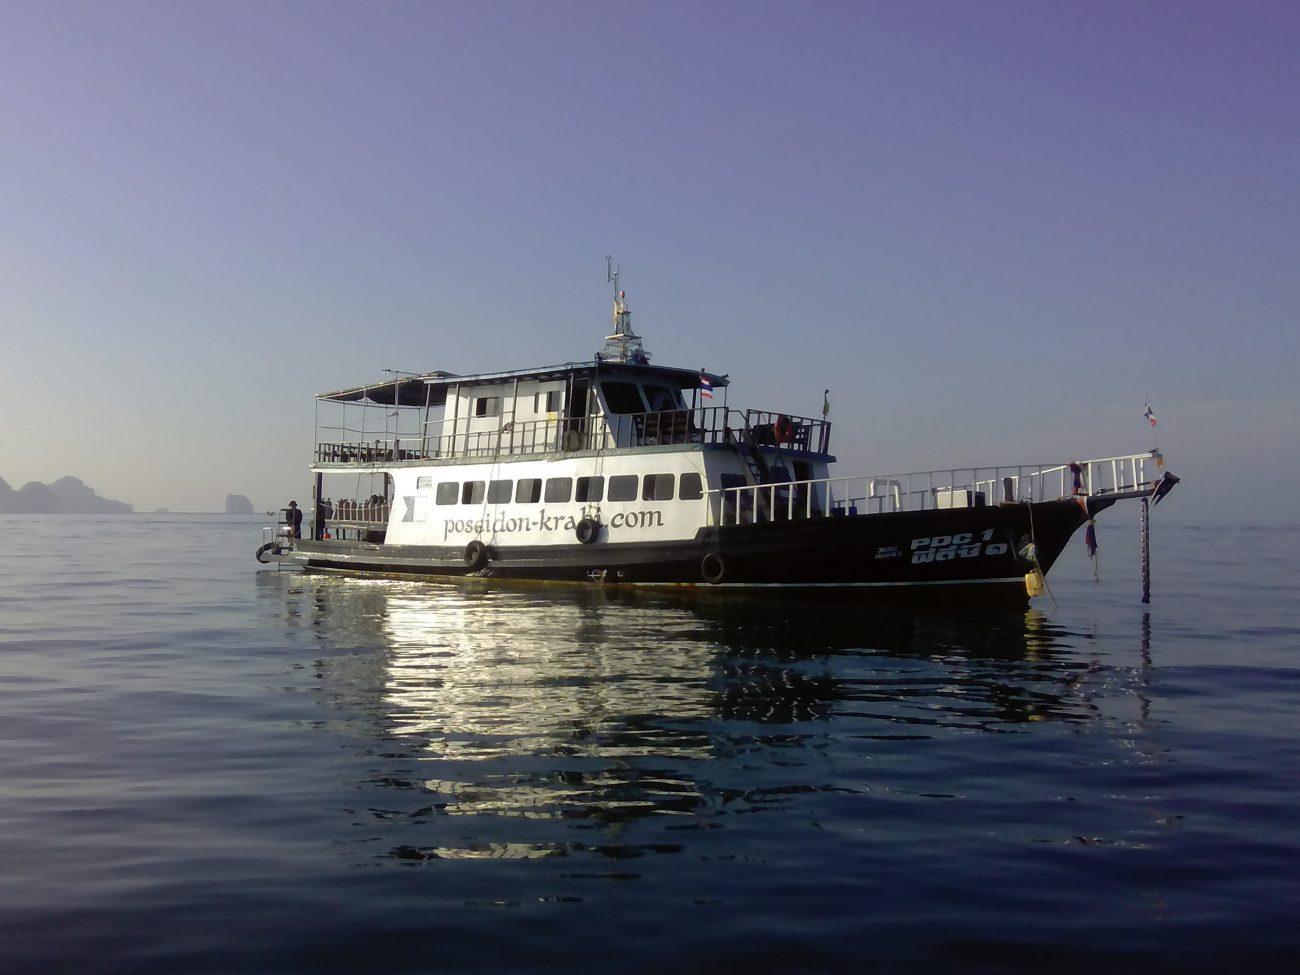 PDC1 Poseidon Dive Center Boat